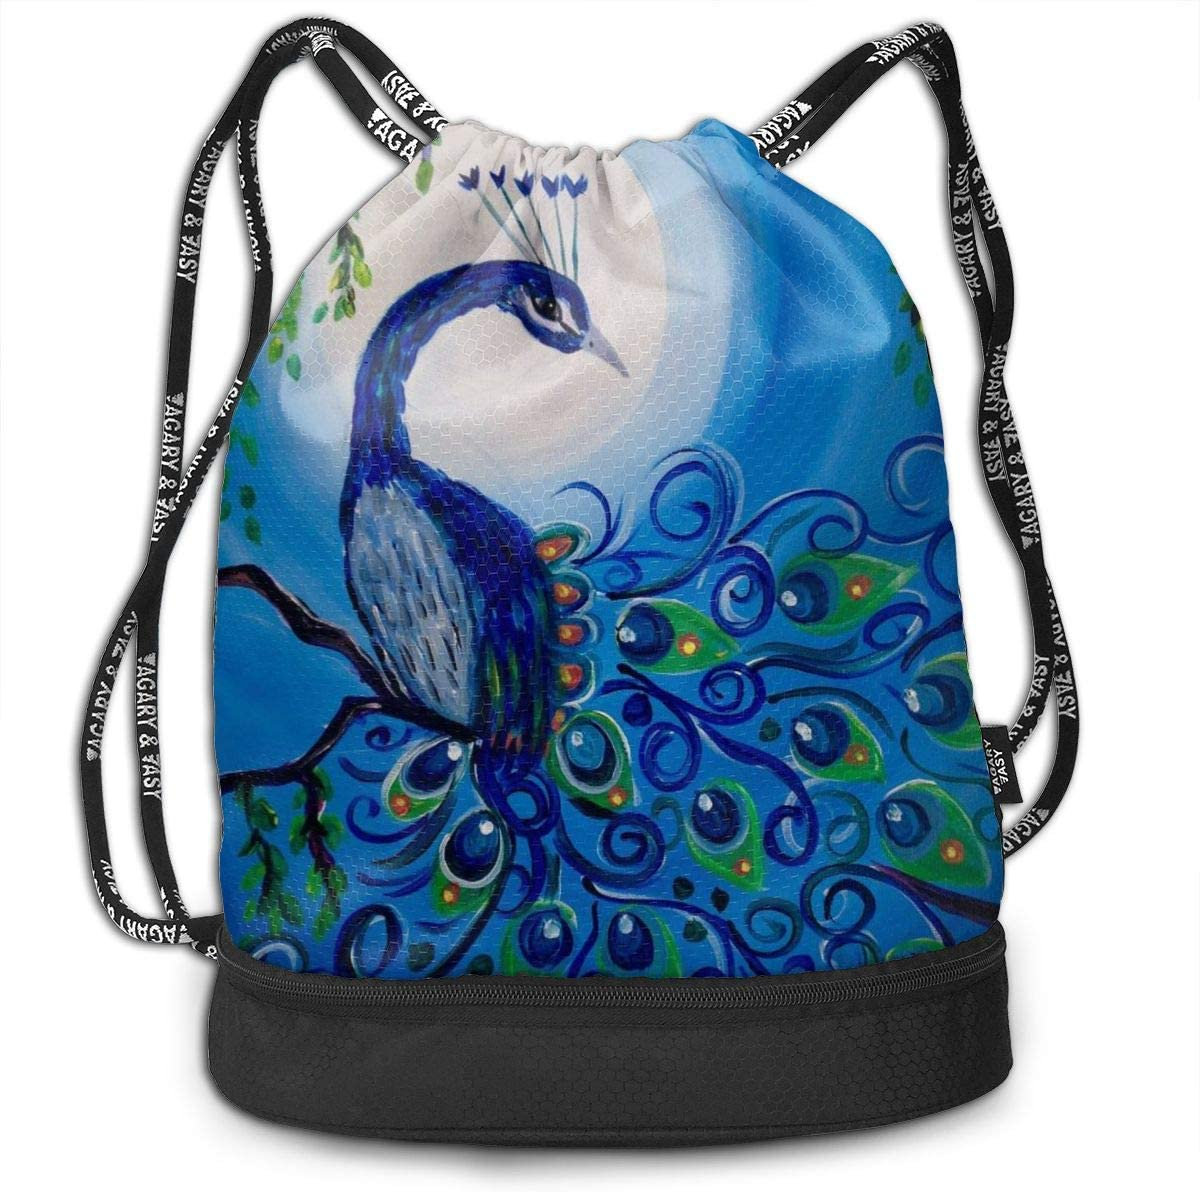 GymSack Drawstring Bag Sackpack Peacock Sport Cinch Pack Simple Bundle Pocke Backpack For Men Women